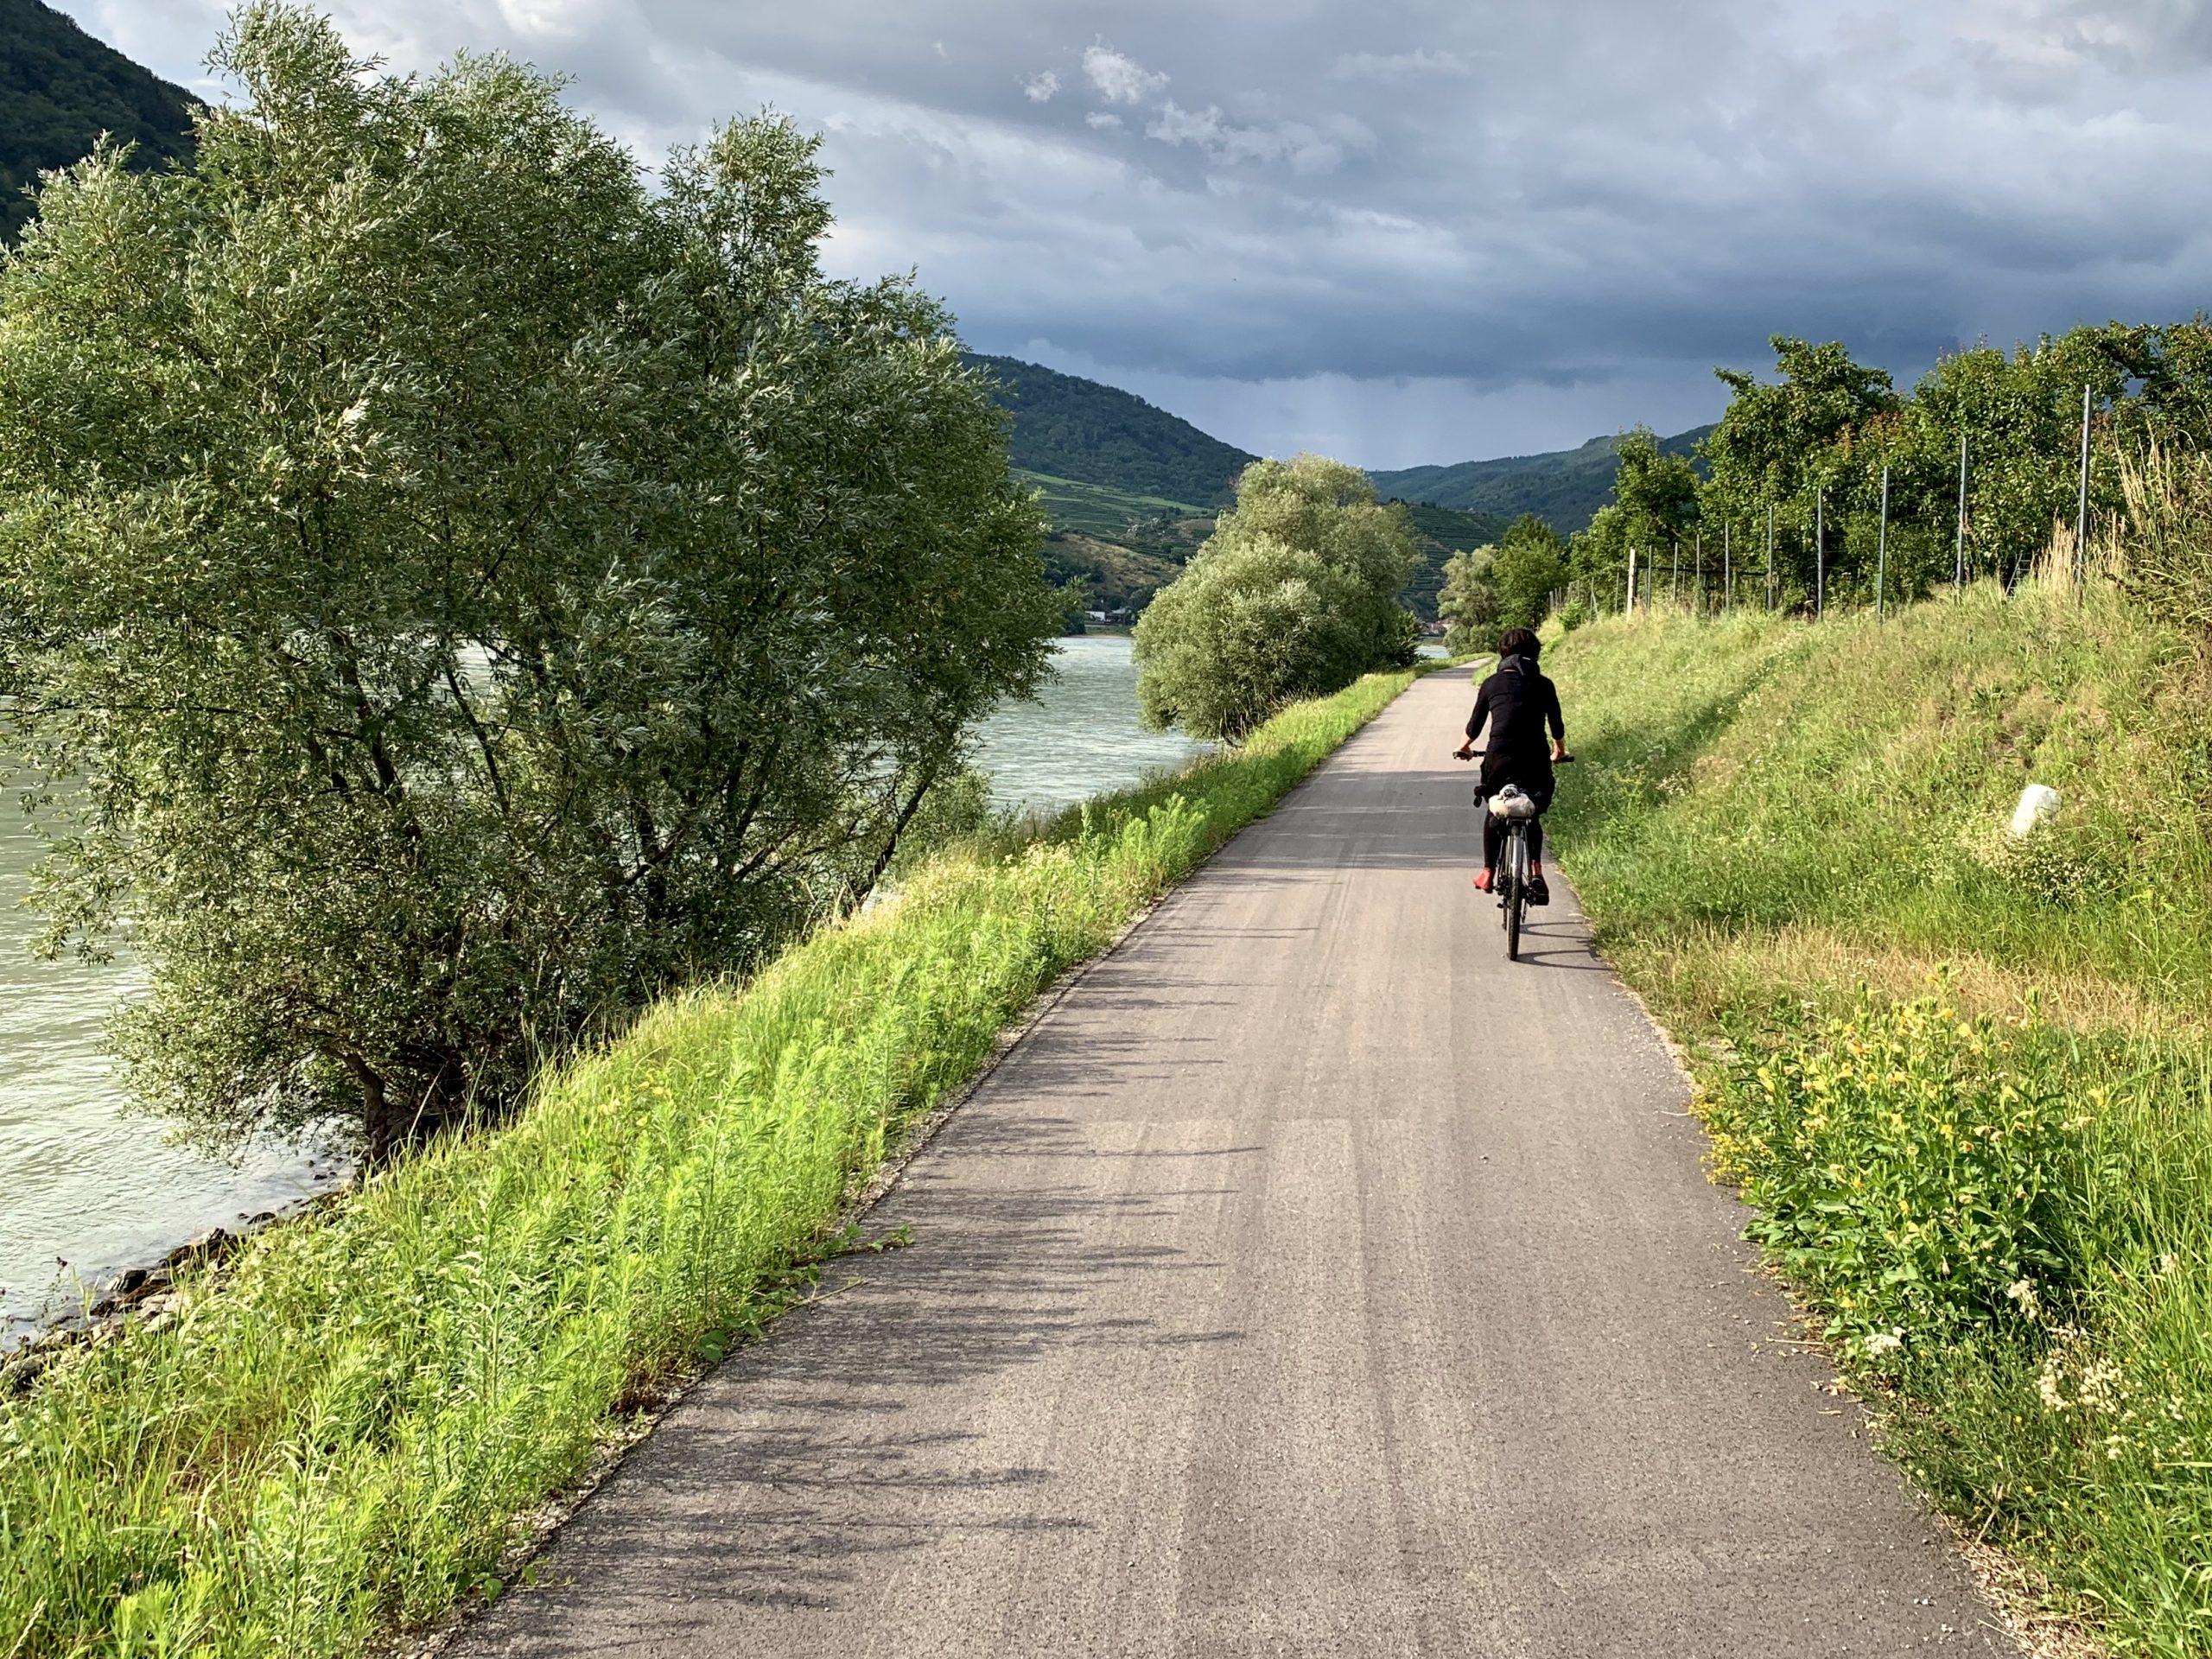 Dunajská cyklostezka Passau Vídeň poblíž Arnsdorfu